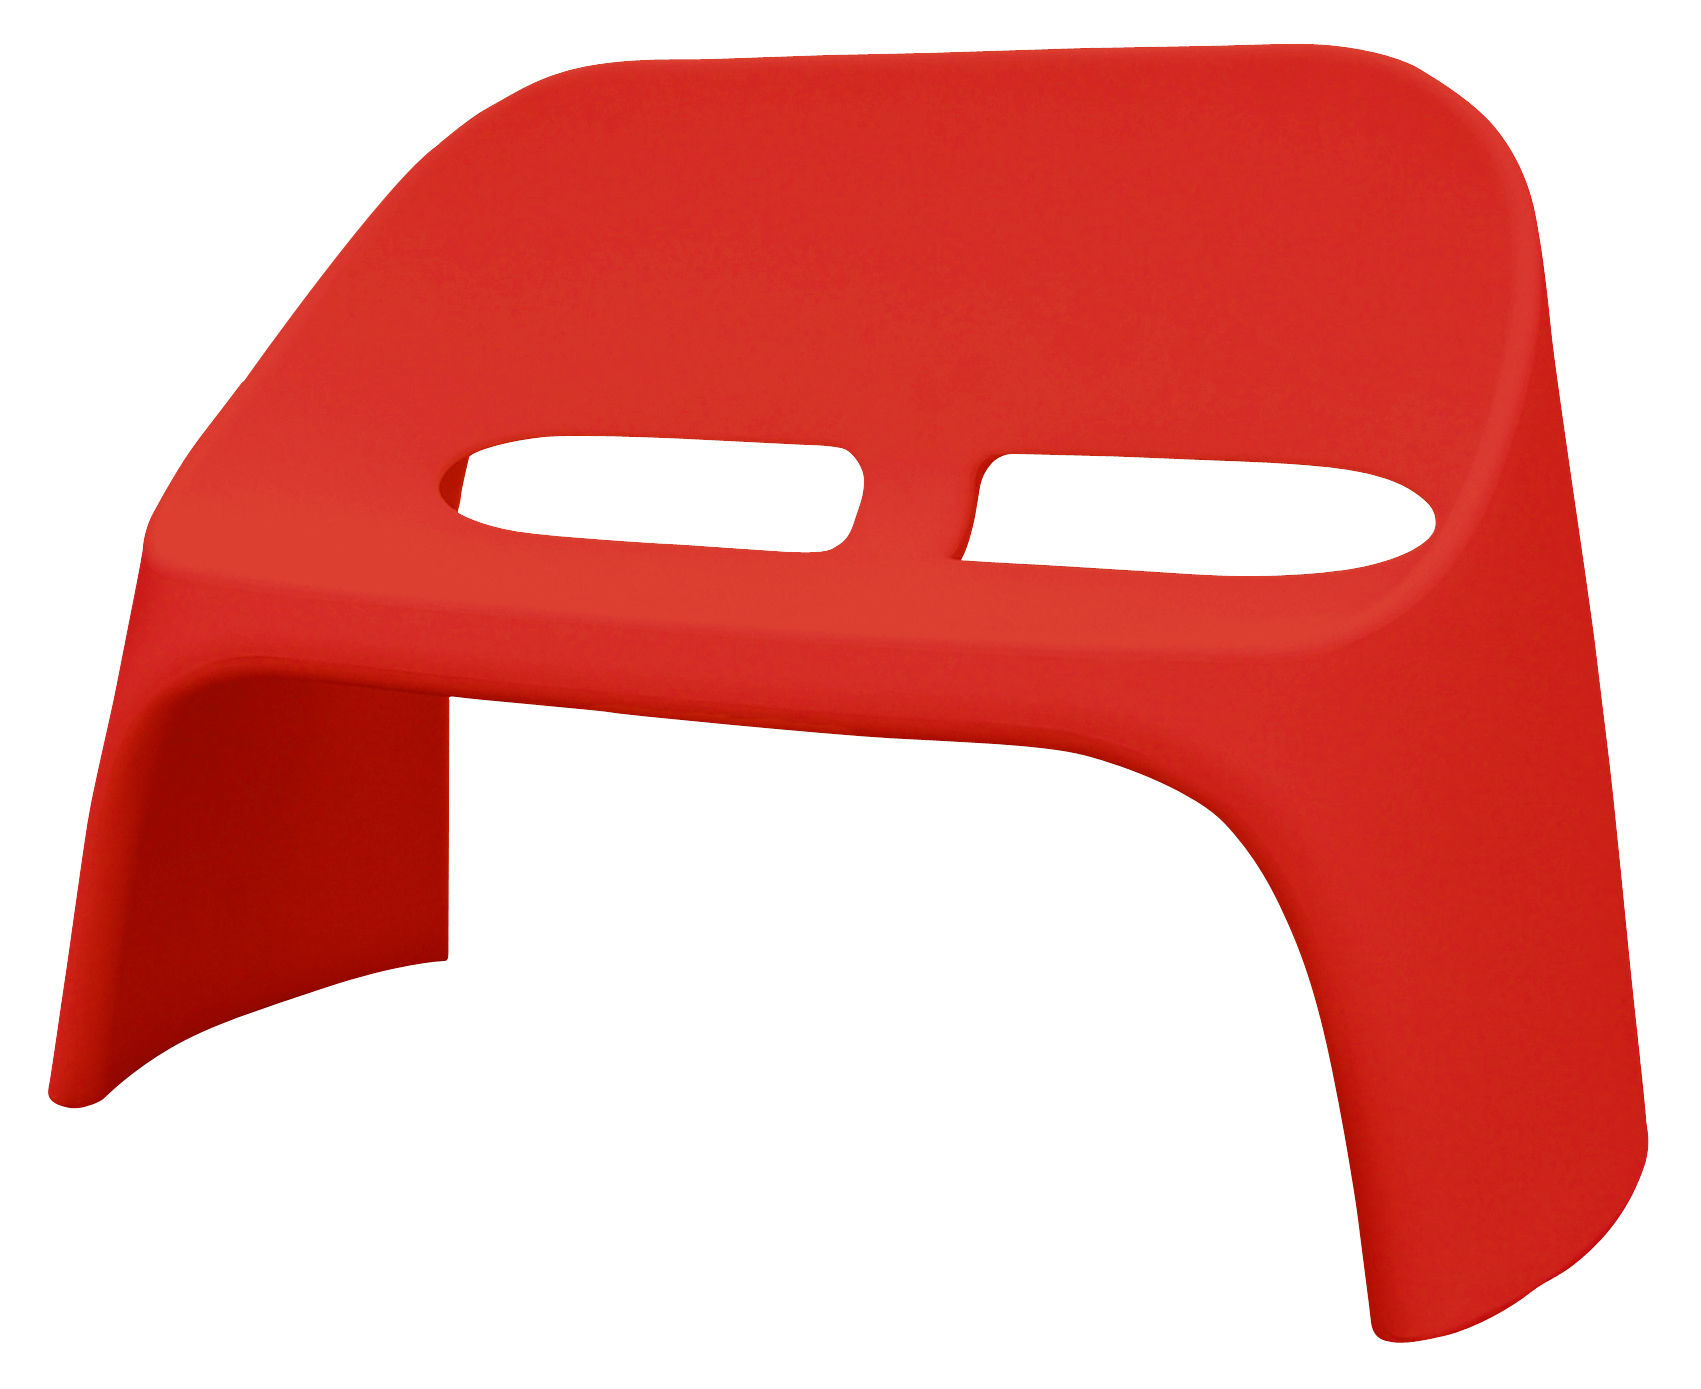 Arredamento - Panchine - Panca con schienale Amélie - 2 posti di Slide - Rosso - Polietilene